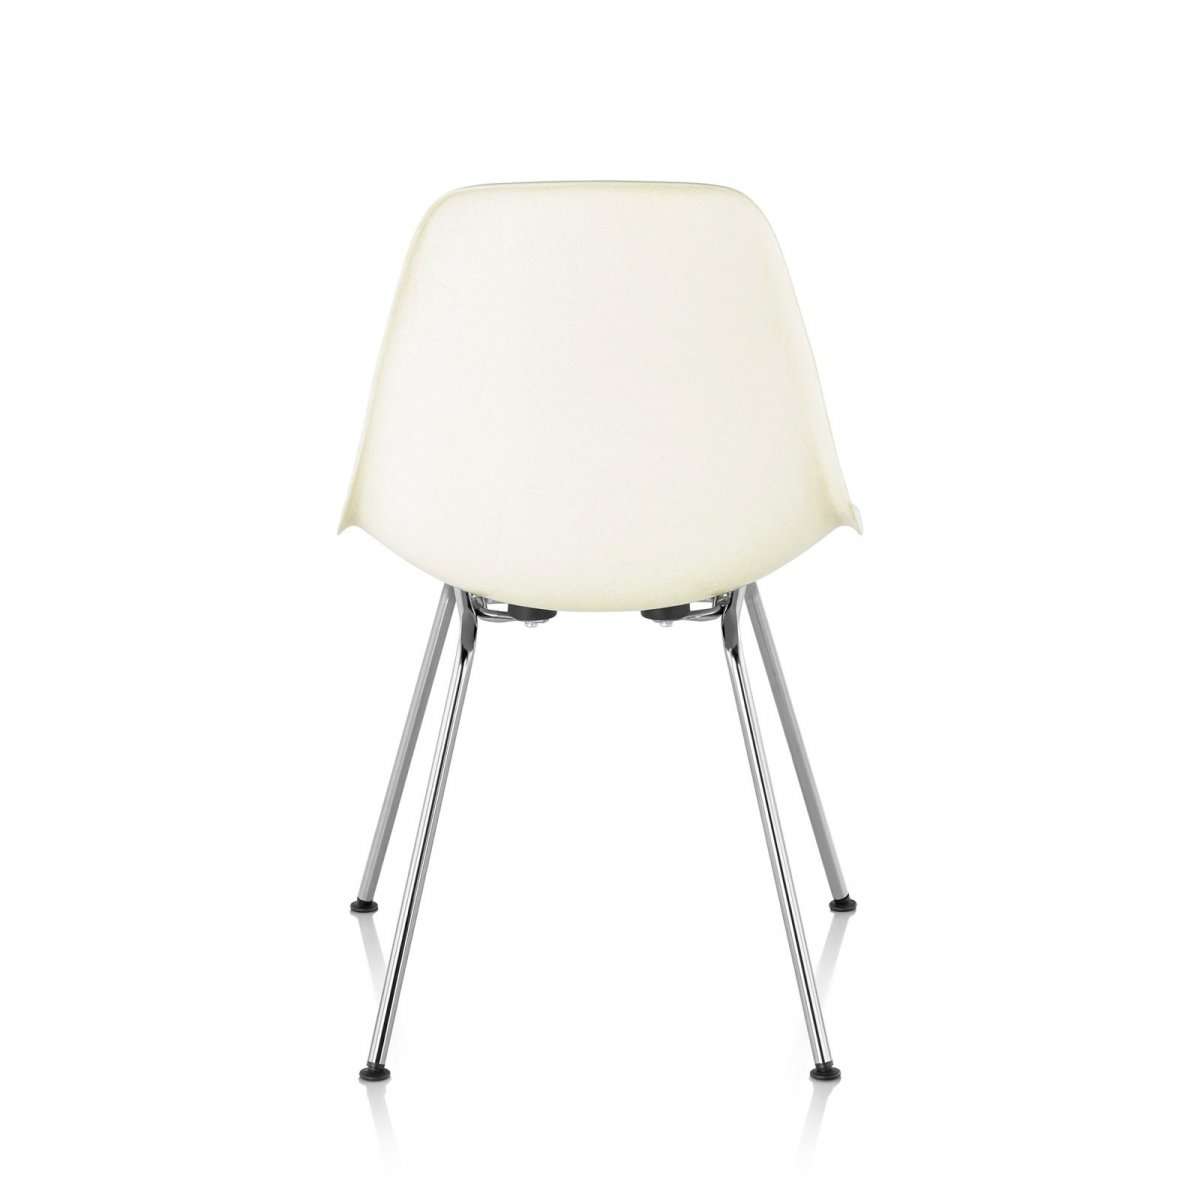 Eames Molded Plastic Side Chair 4-Leg Base, white, back view.